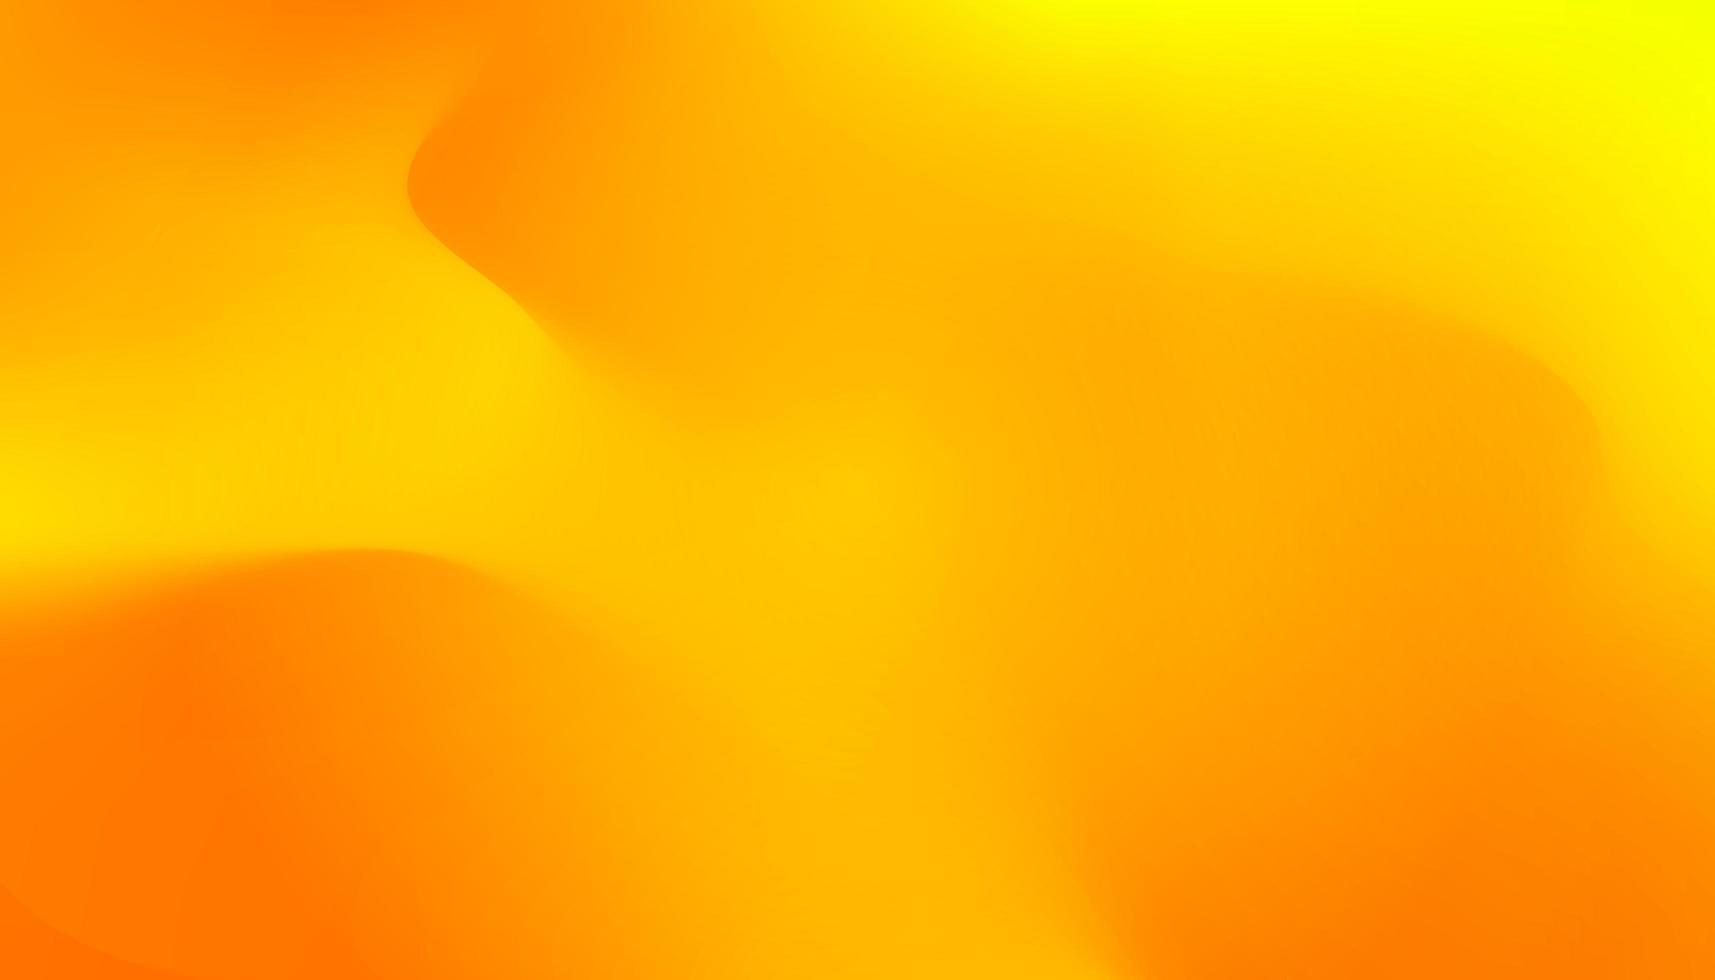 sappige oranje golvende gradiëntbanner. verse warme zonnige kleuren dynamische vloeibare abstracte achtergrond. goud mesh behang vector